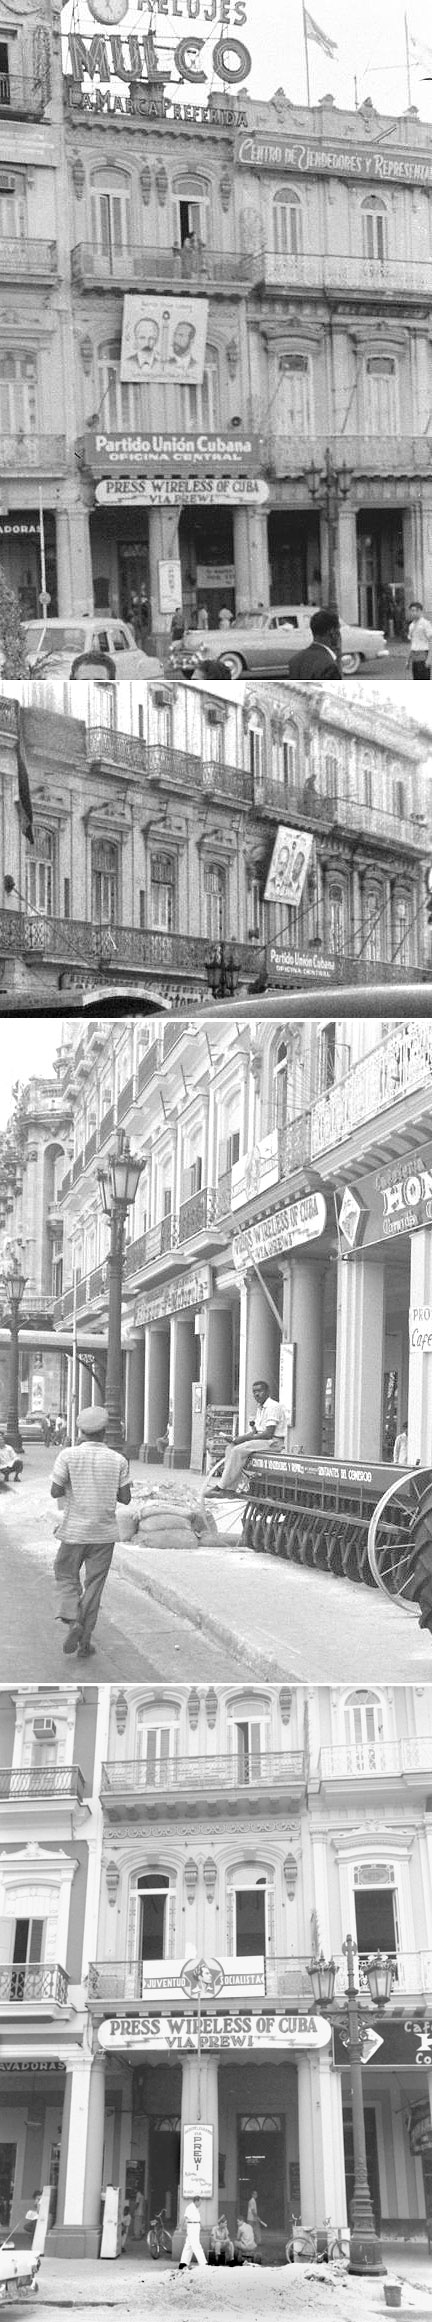 Cienfuegos - FOTOS DE CUBA ! SOLAMENTES DE ANTES DEL 1958 !!!! - Página 31 De_par10